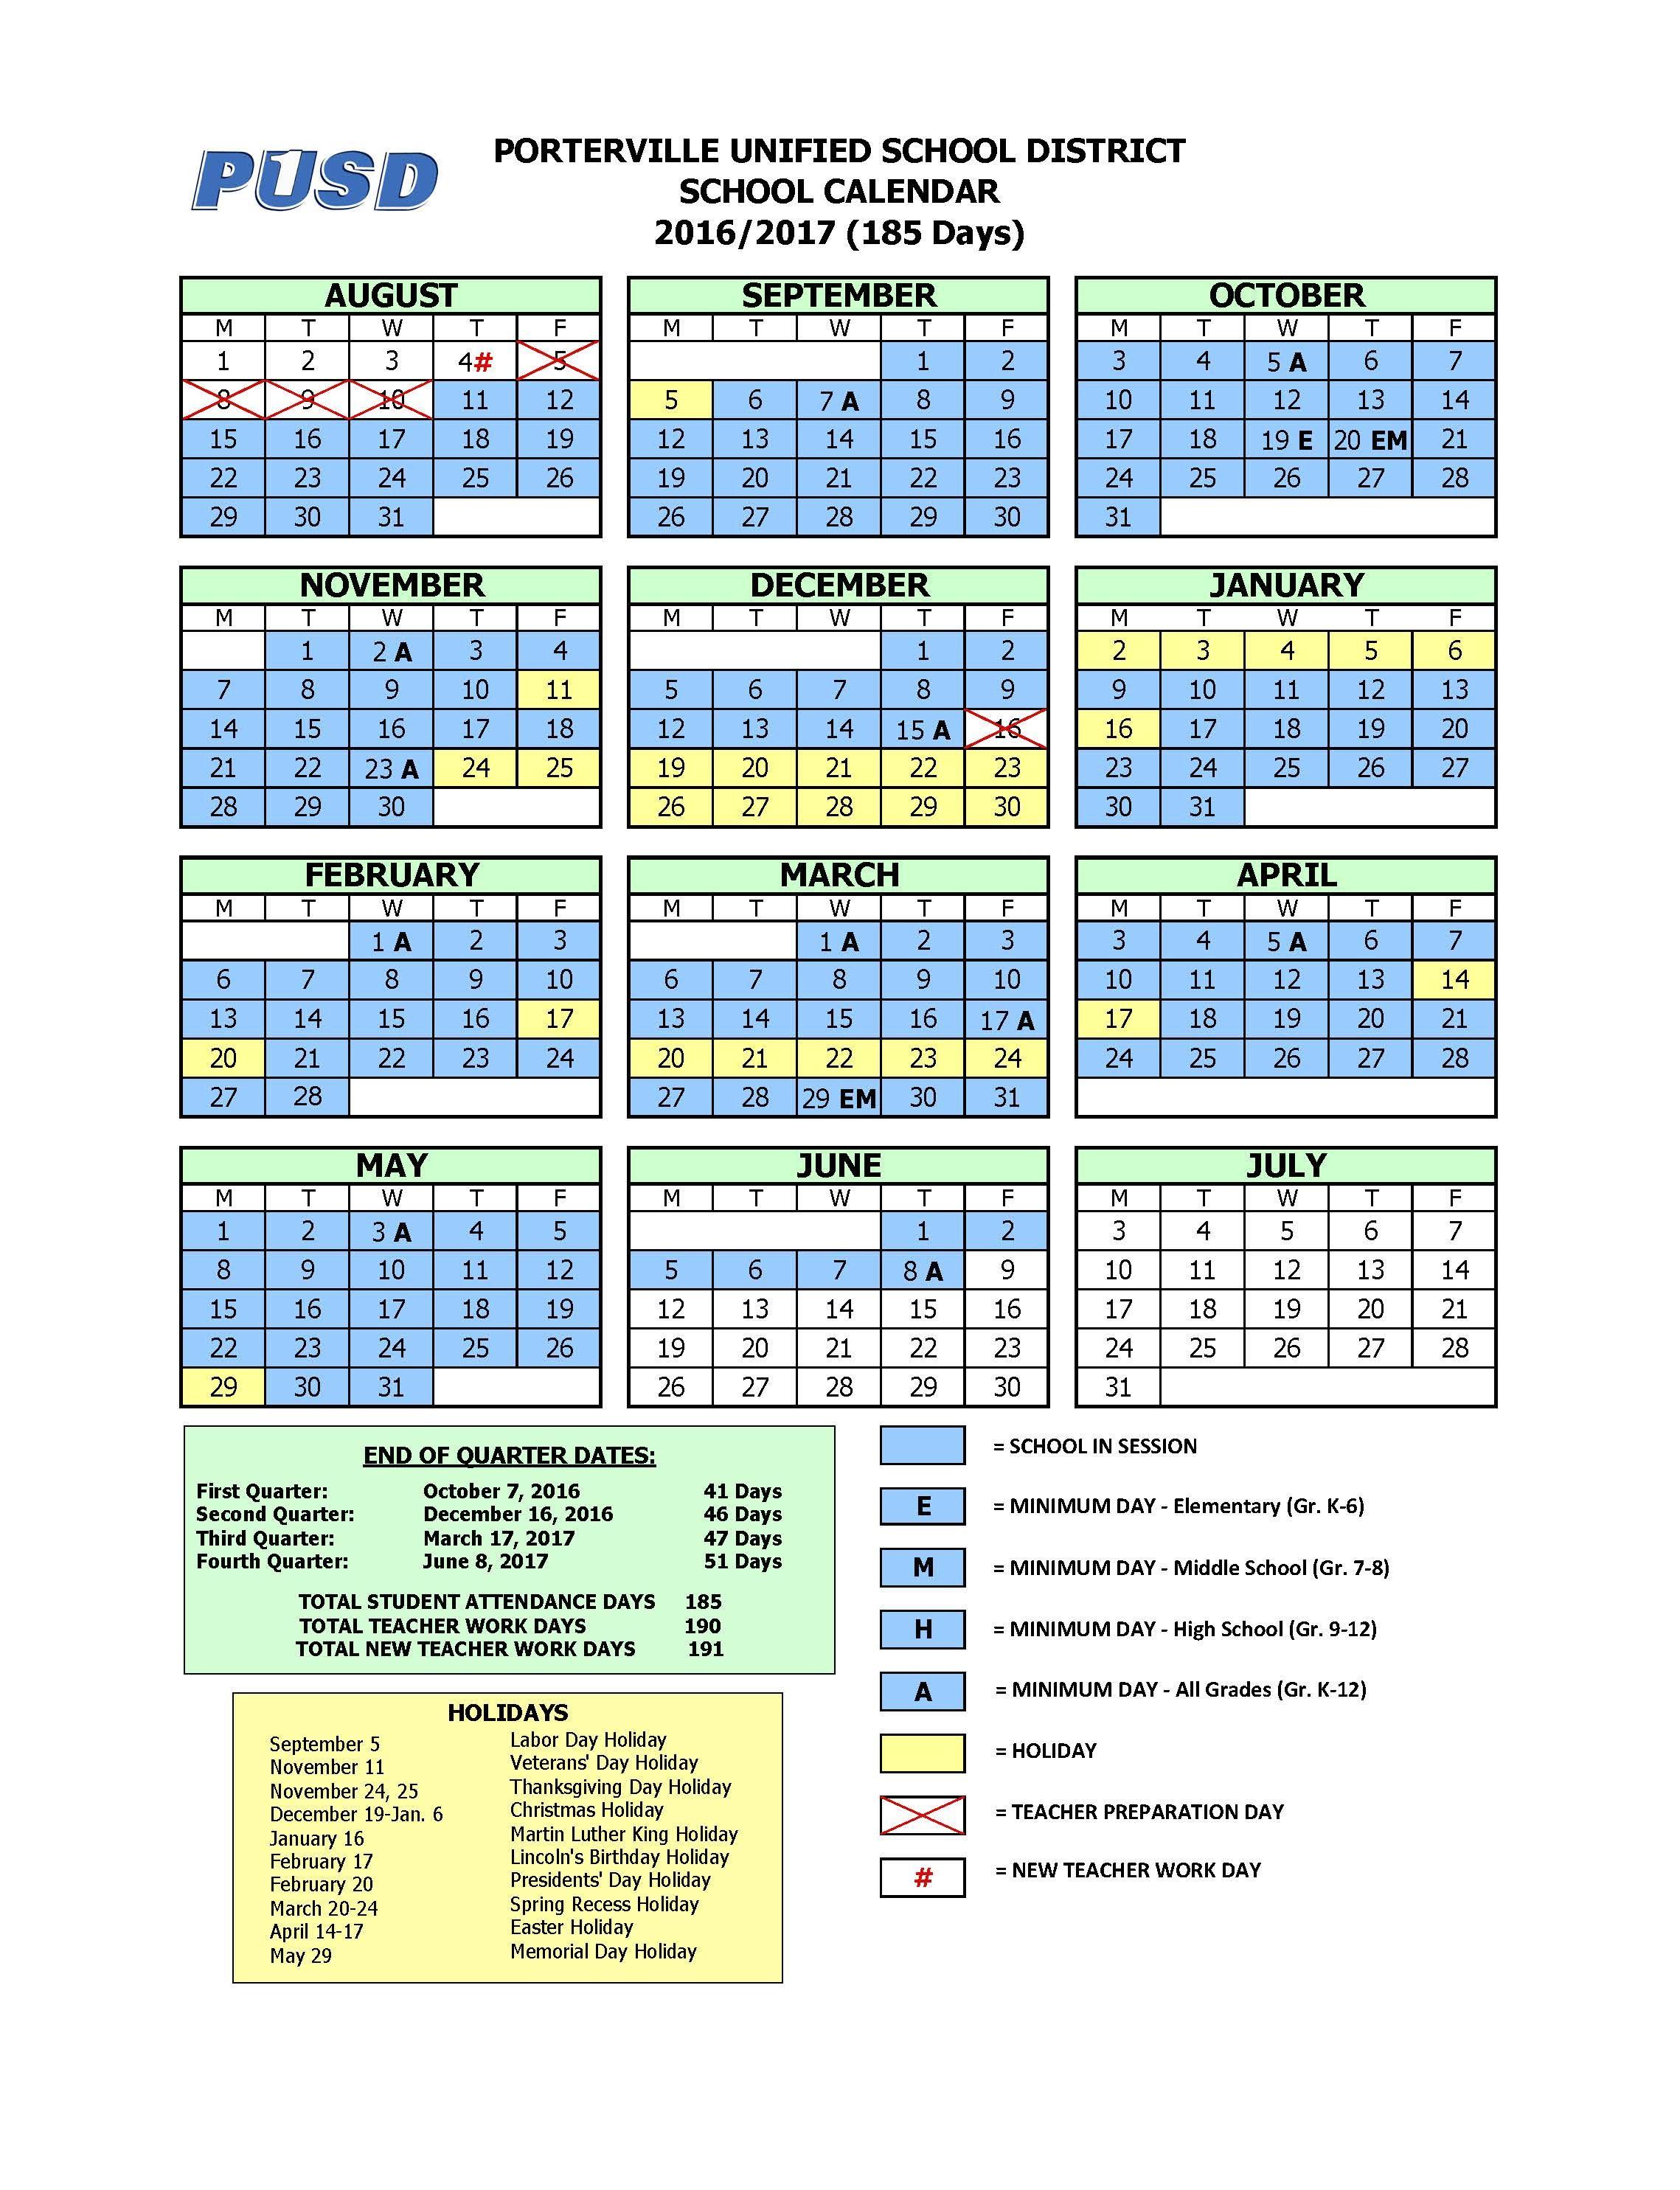 Citrus High School With Porterville School Calendar